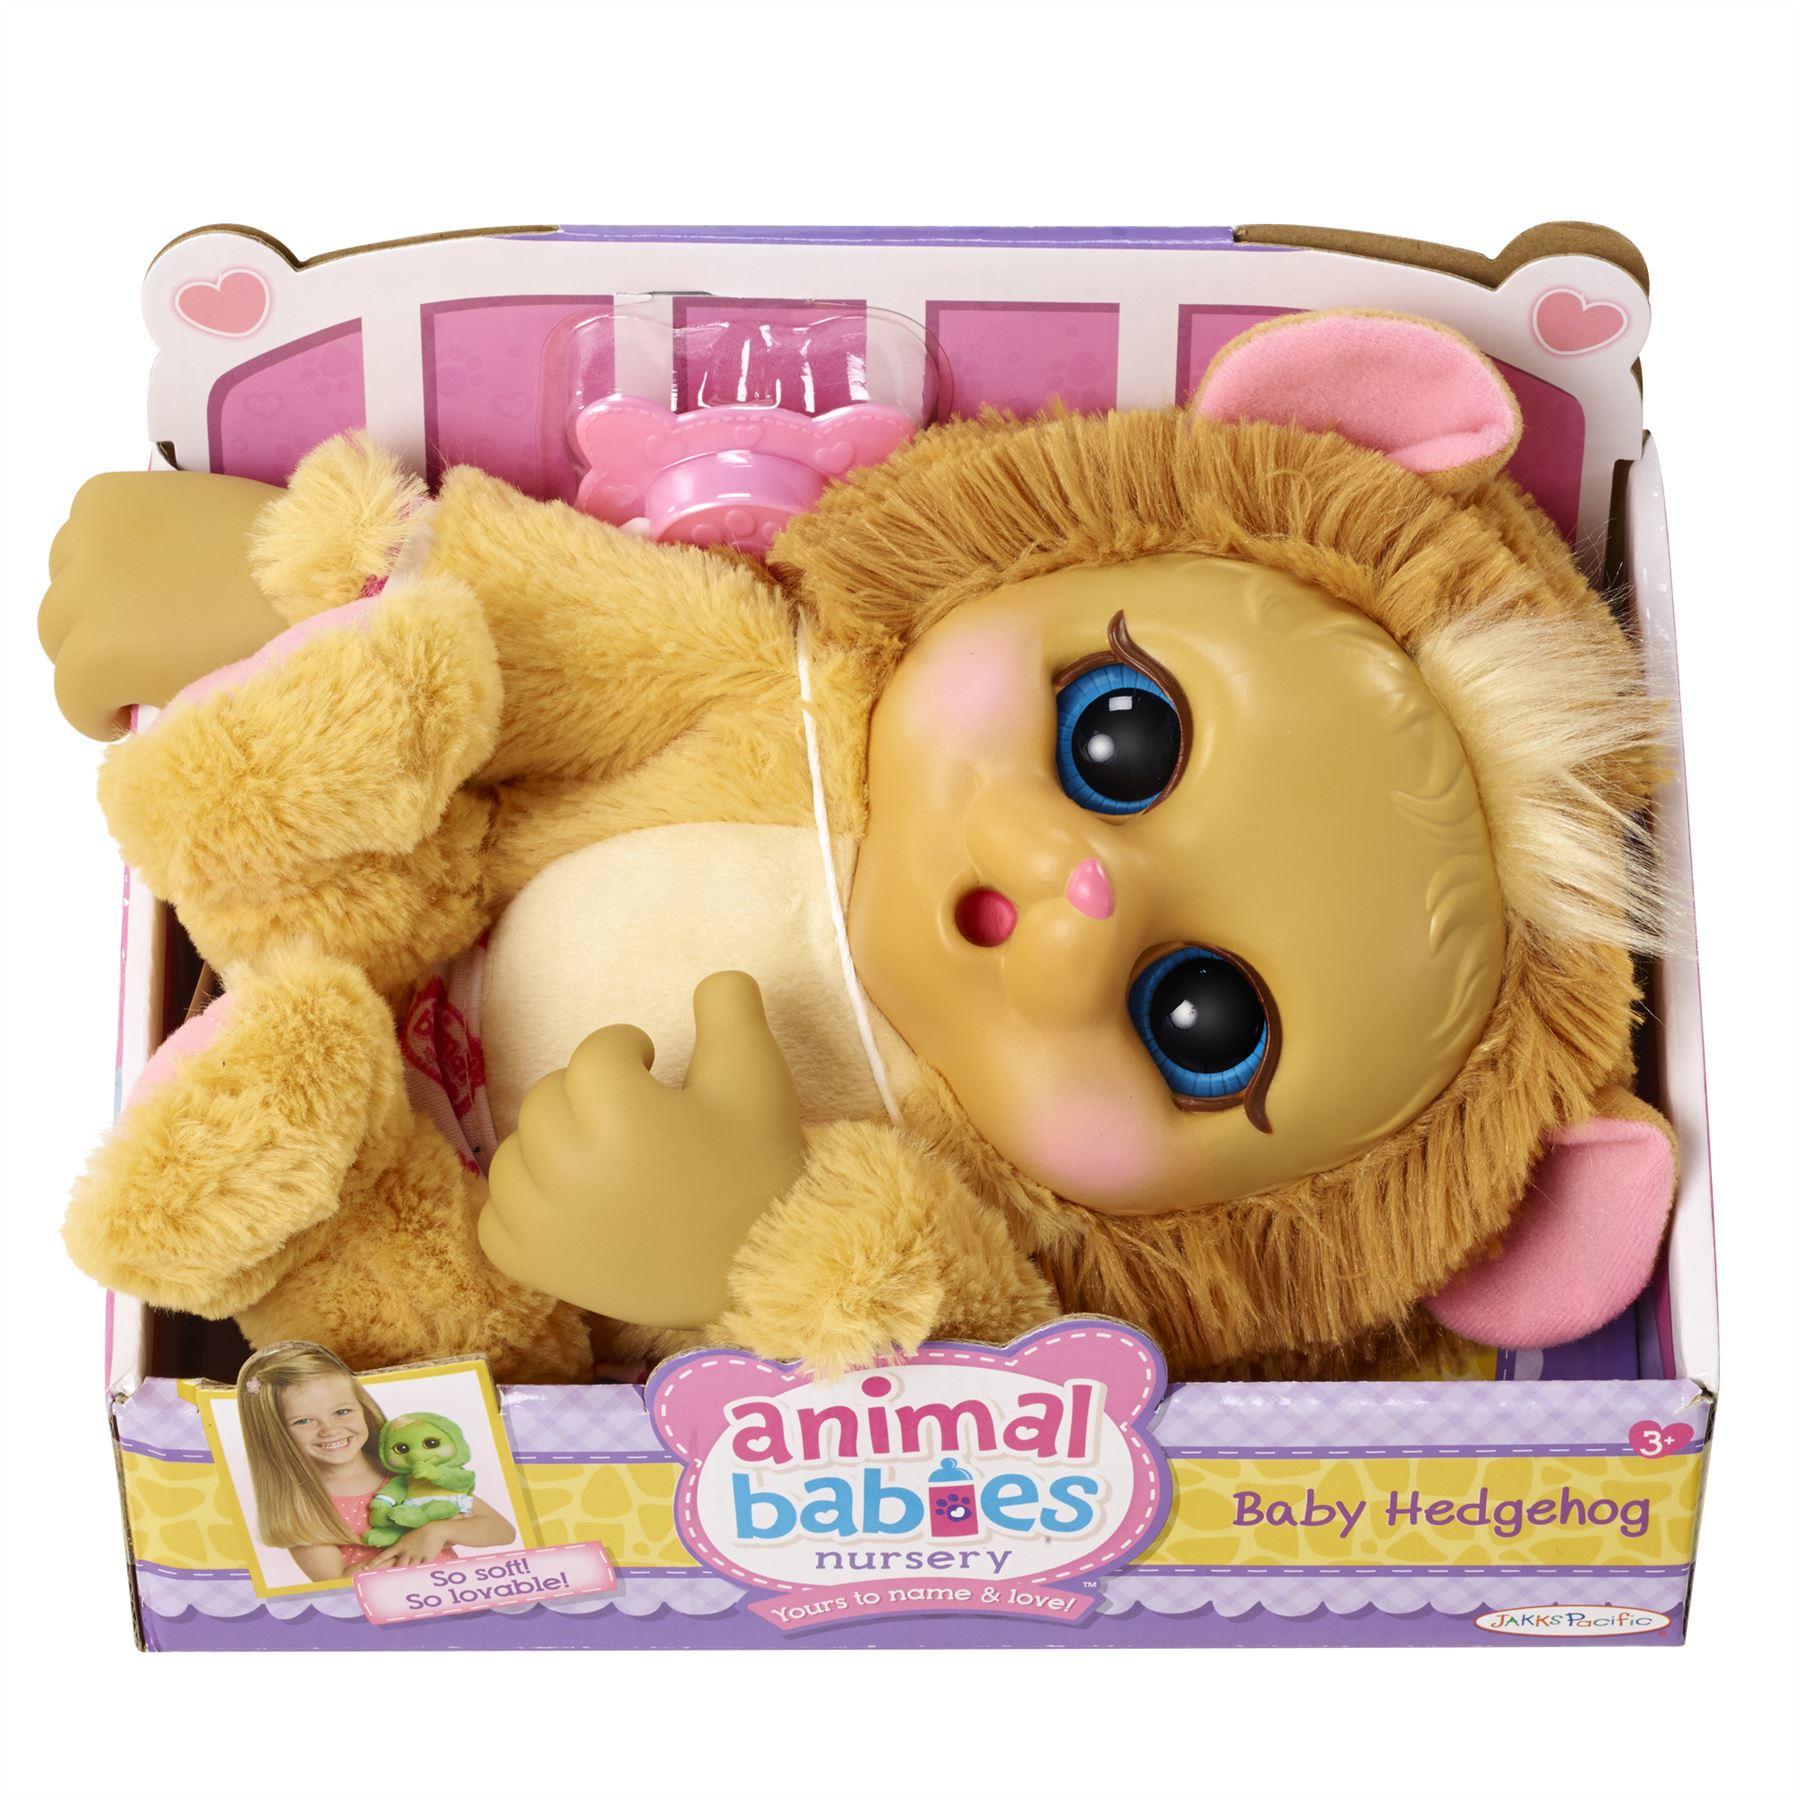 Babies Nursery Plush Doll Baby Hedgehog